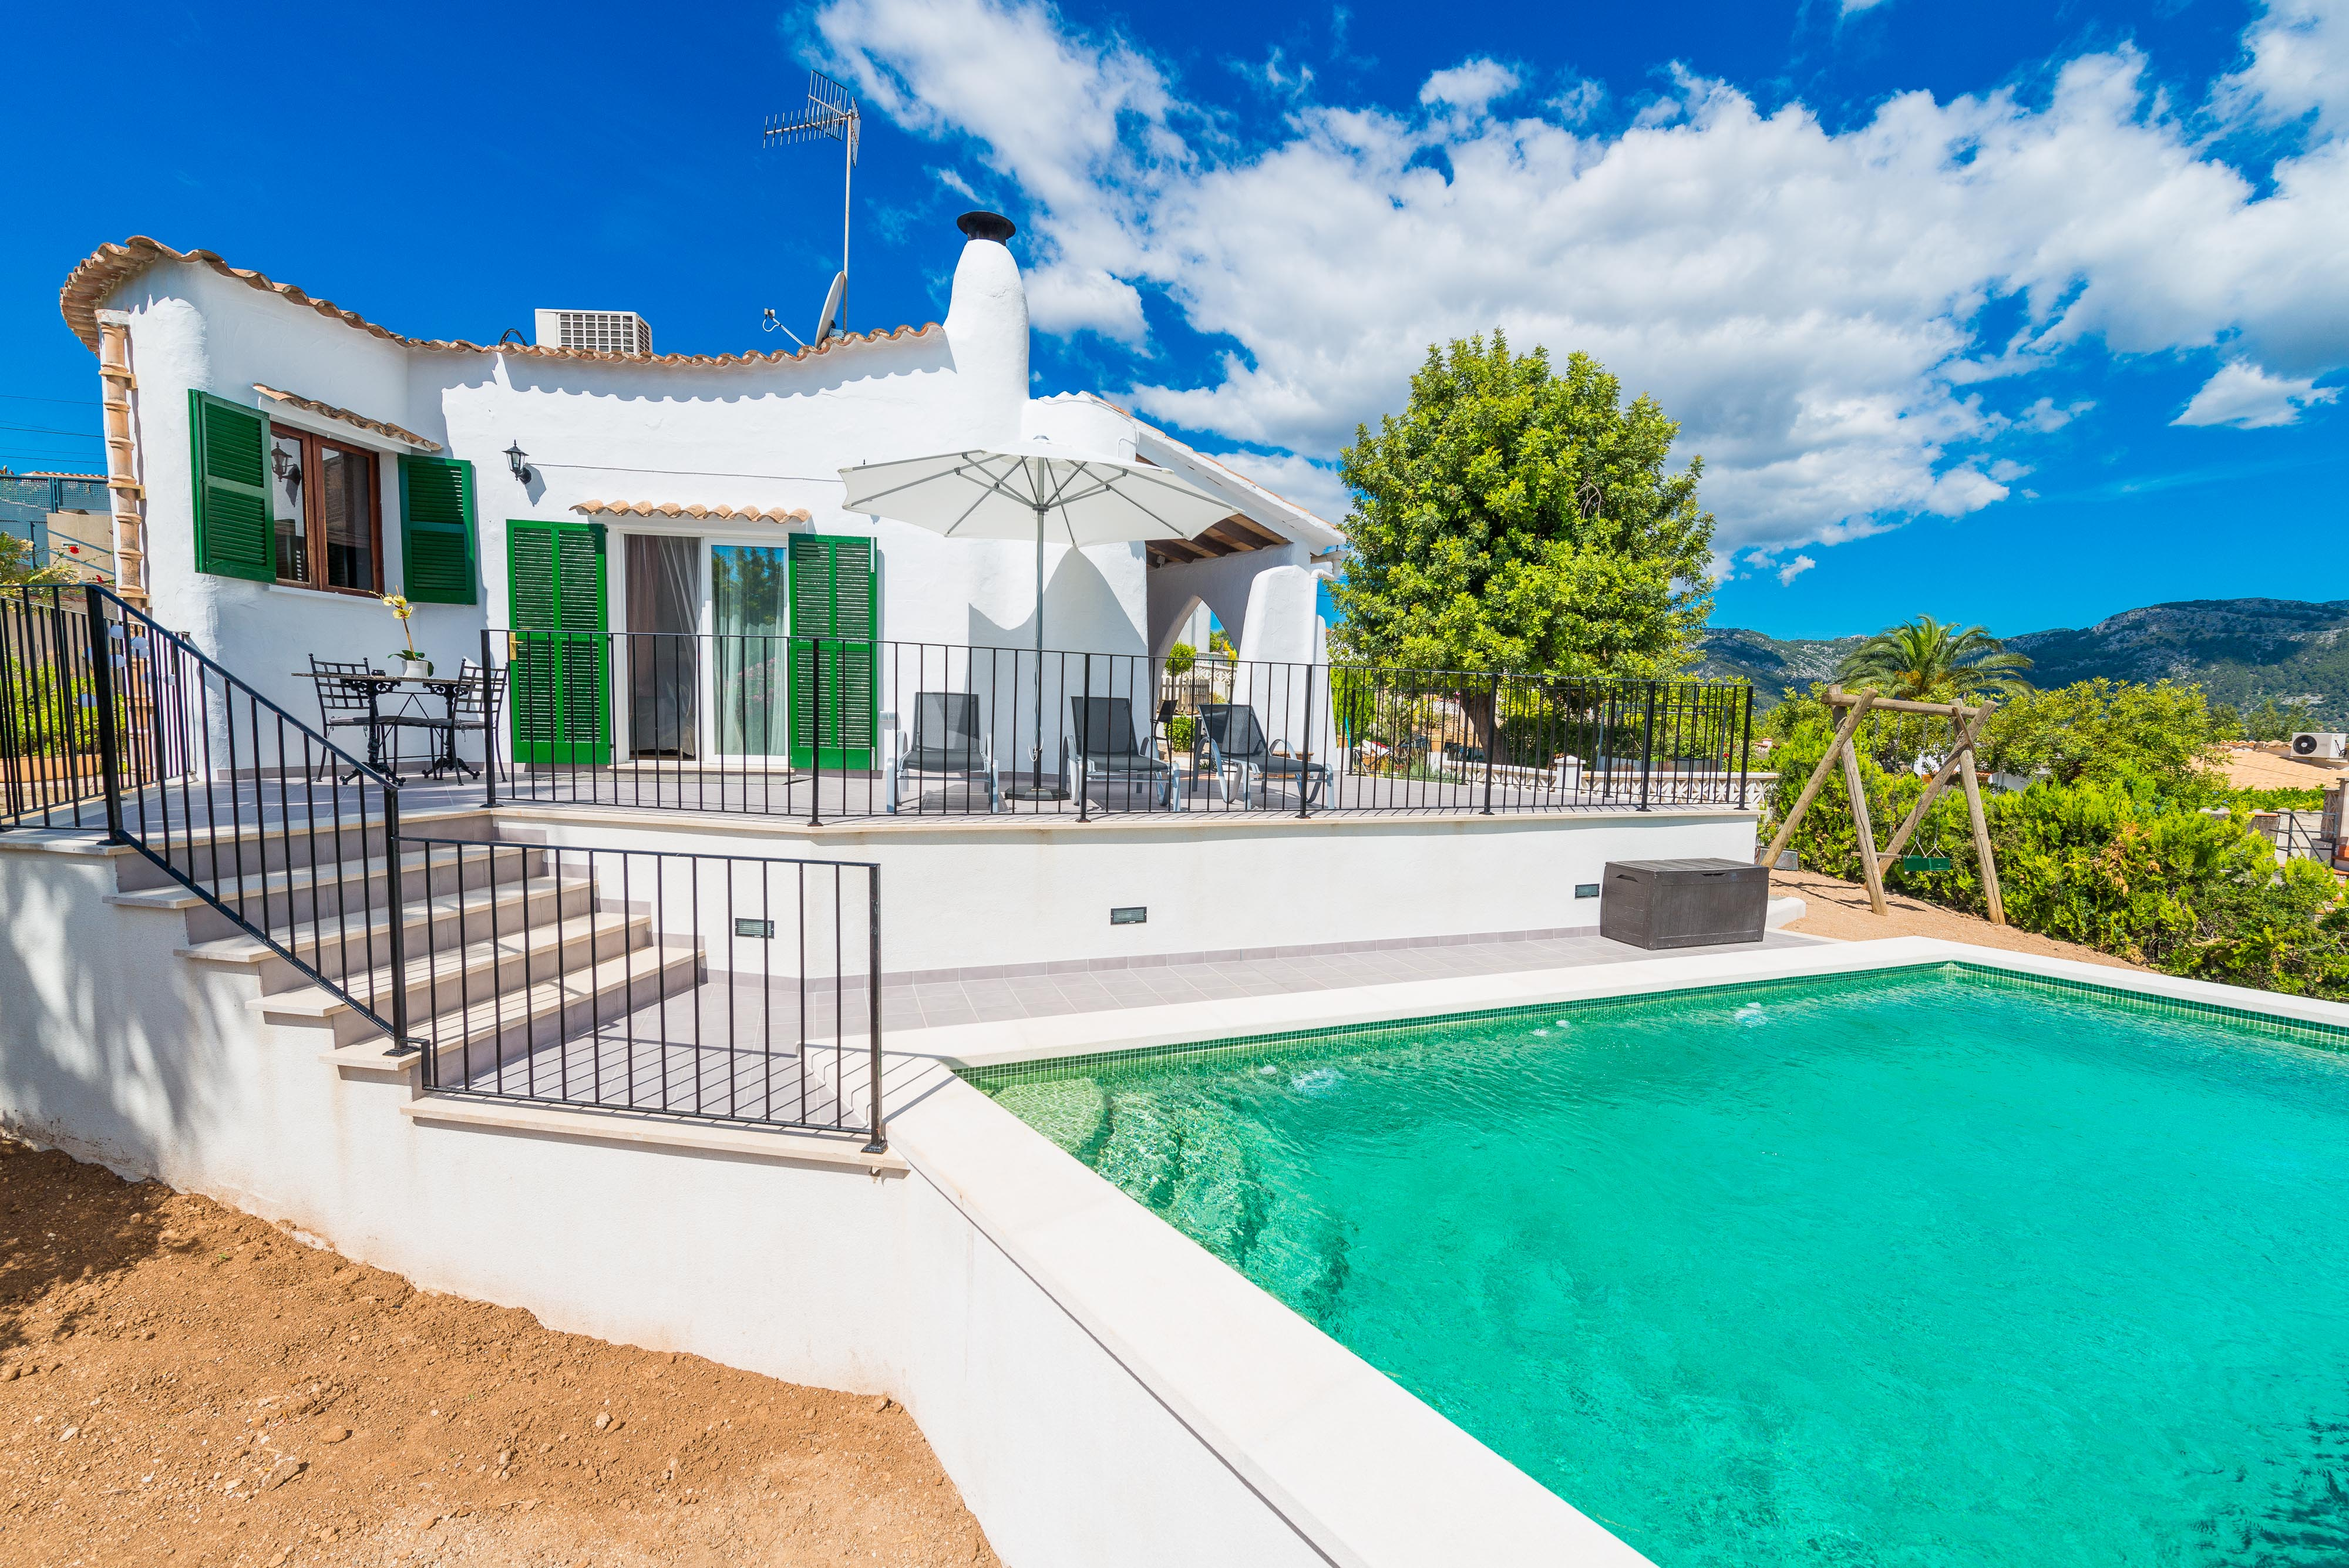 SON BORRÀS - Nord Mallorca - Spanien - Ferienhaus mieten online ...